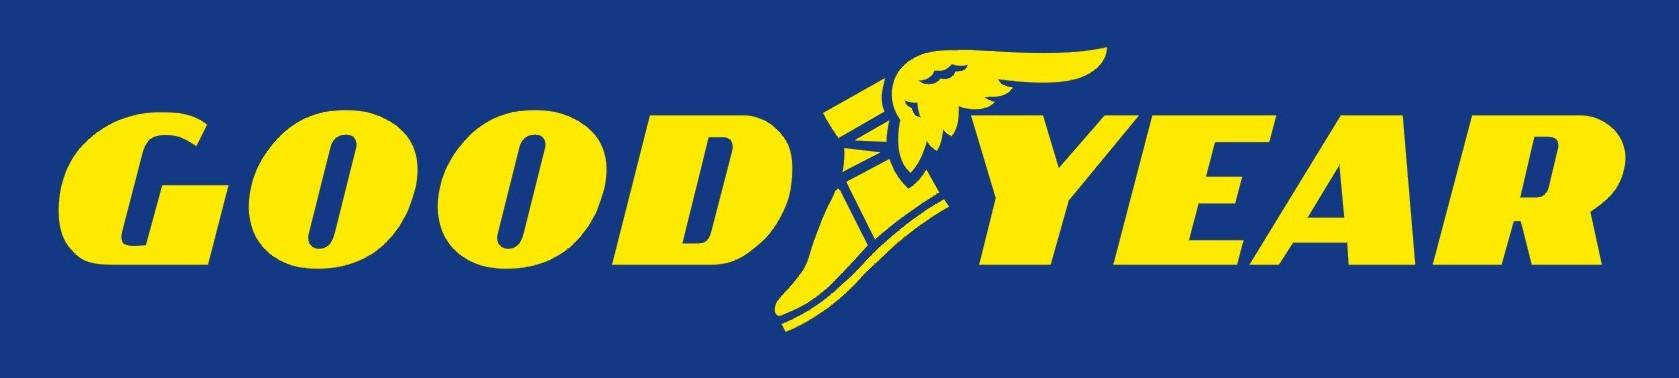 goodyear-logo-1679x378.jpg